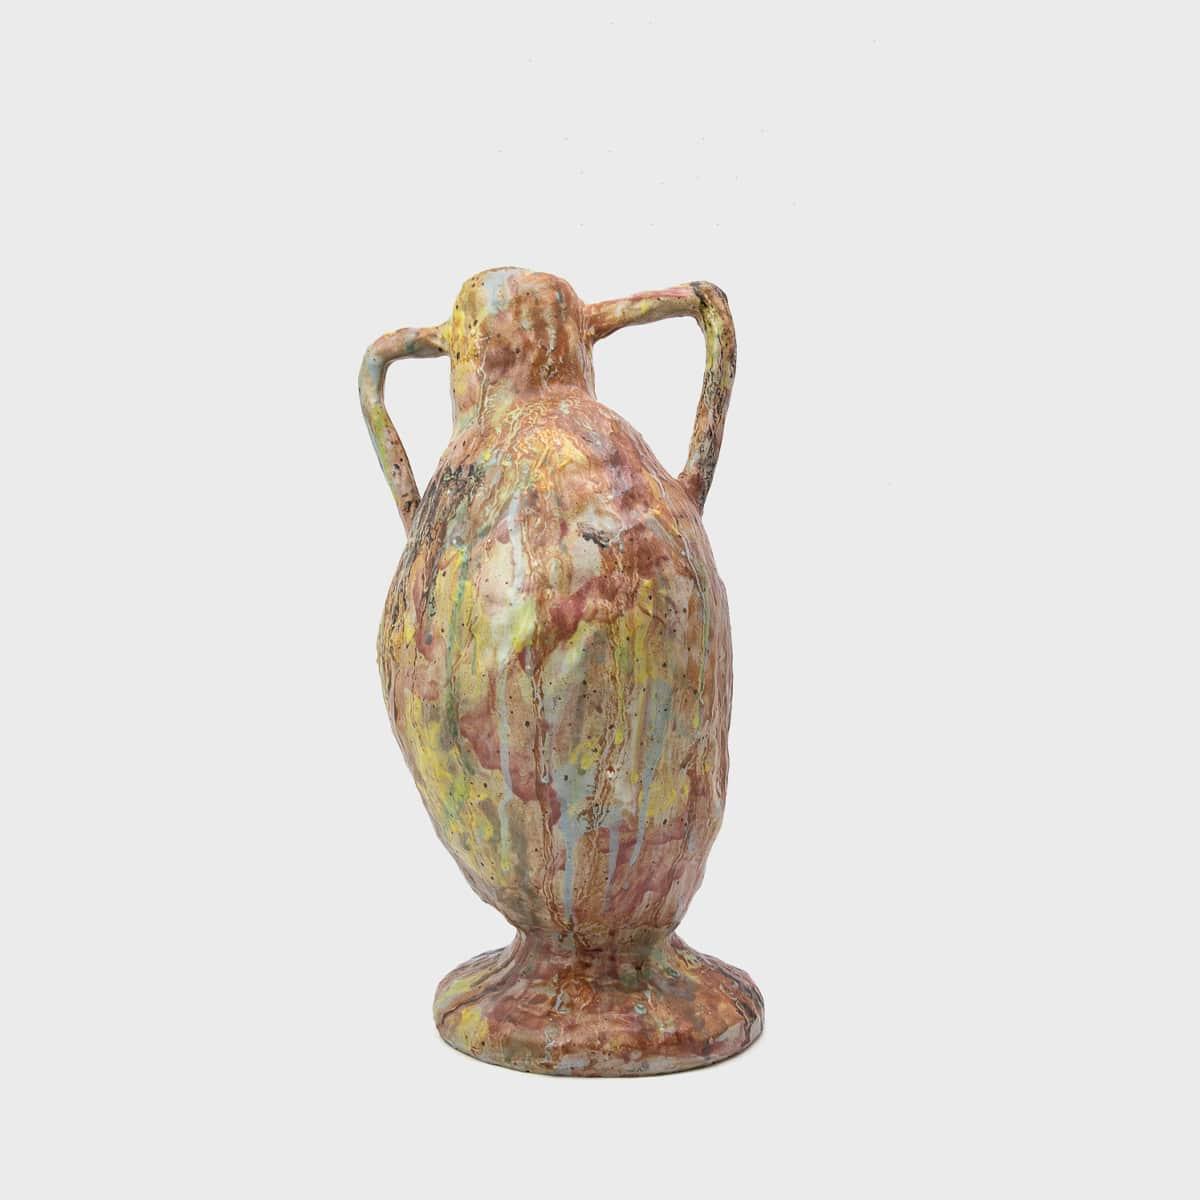 Philip Hedegaard Trickle Paint Vase